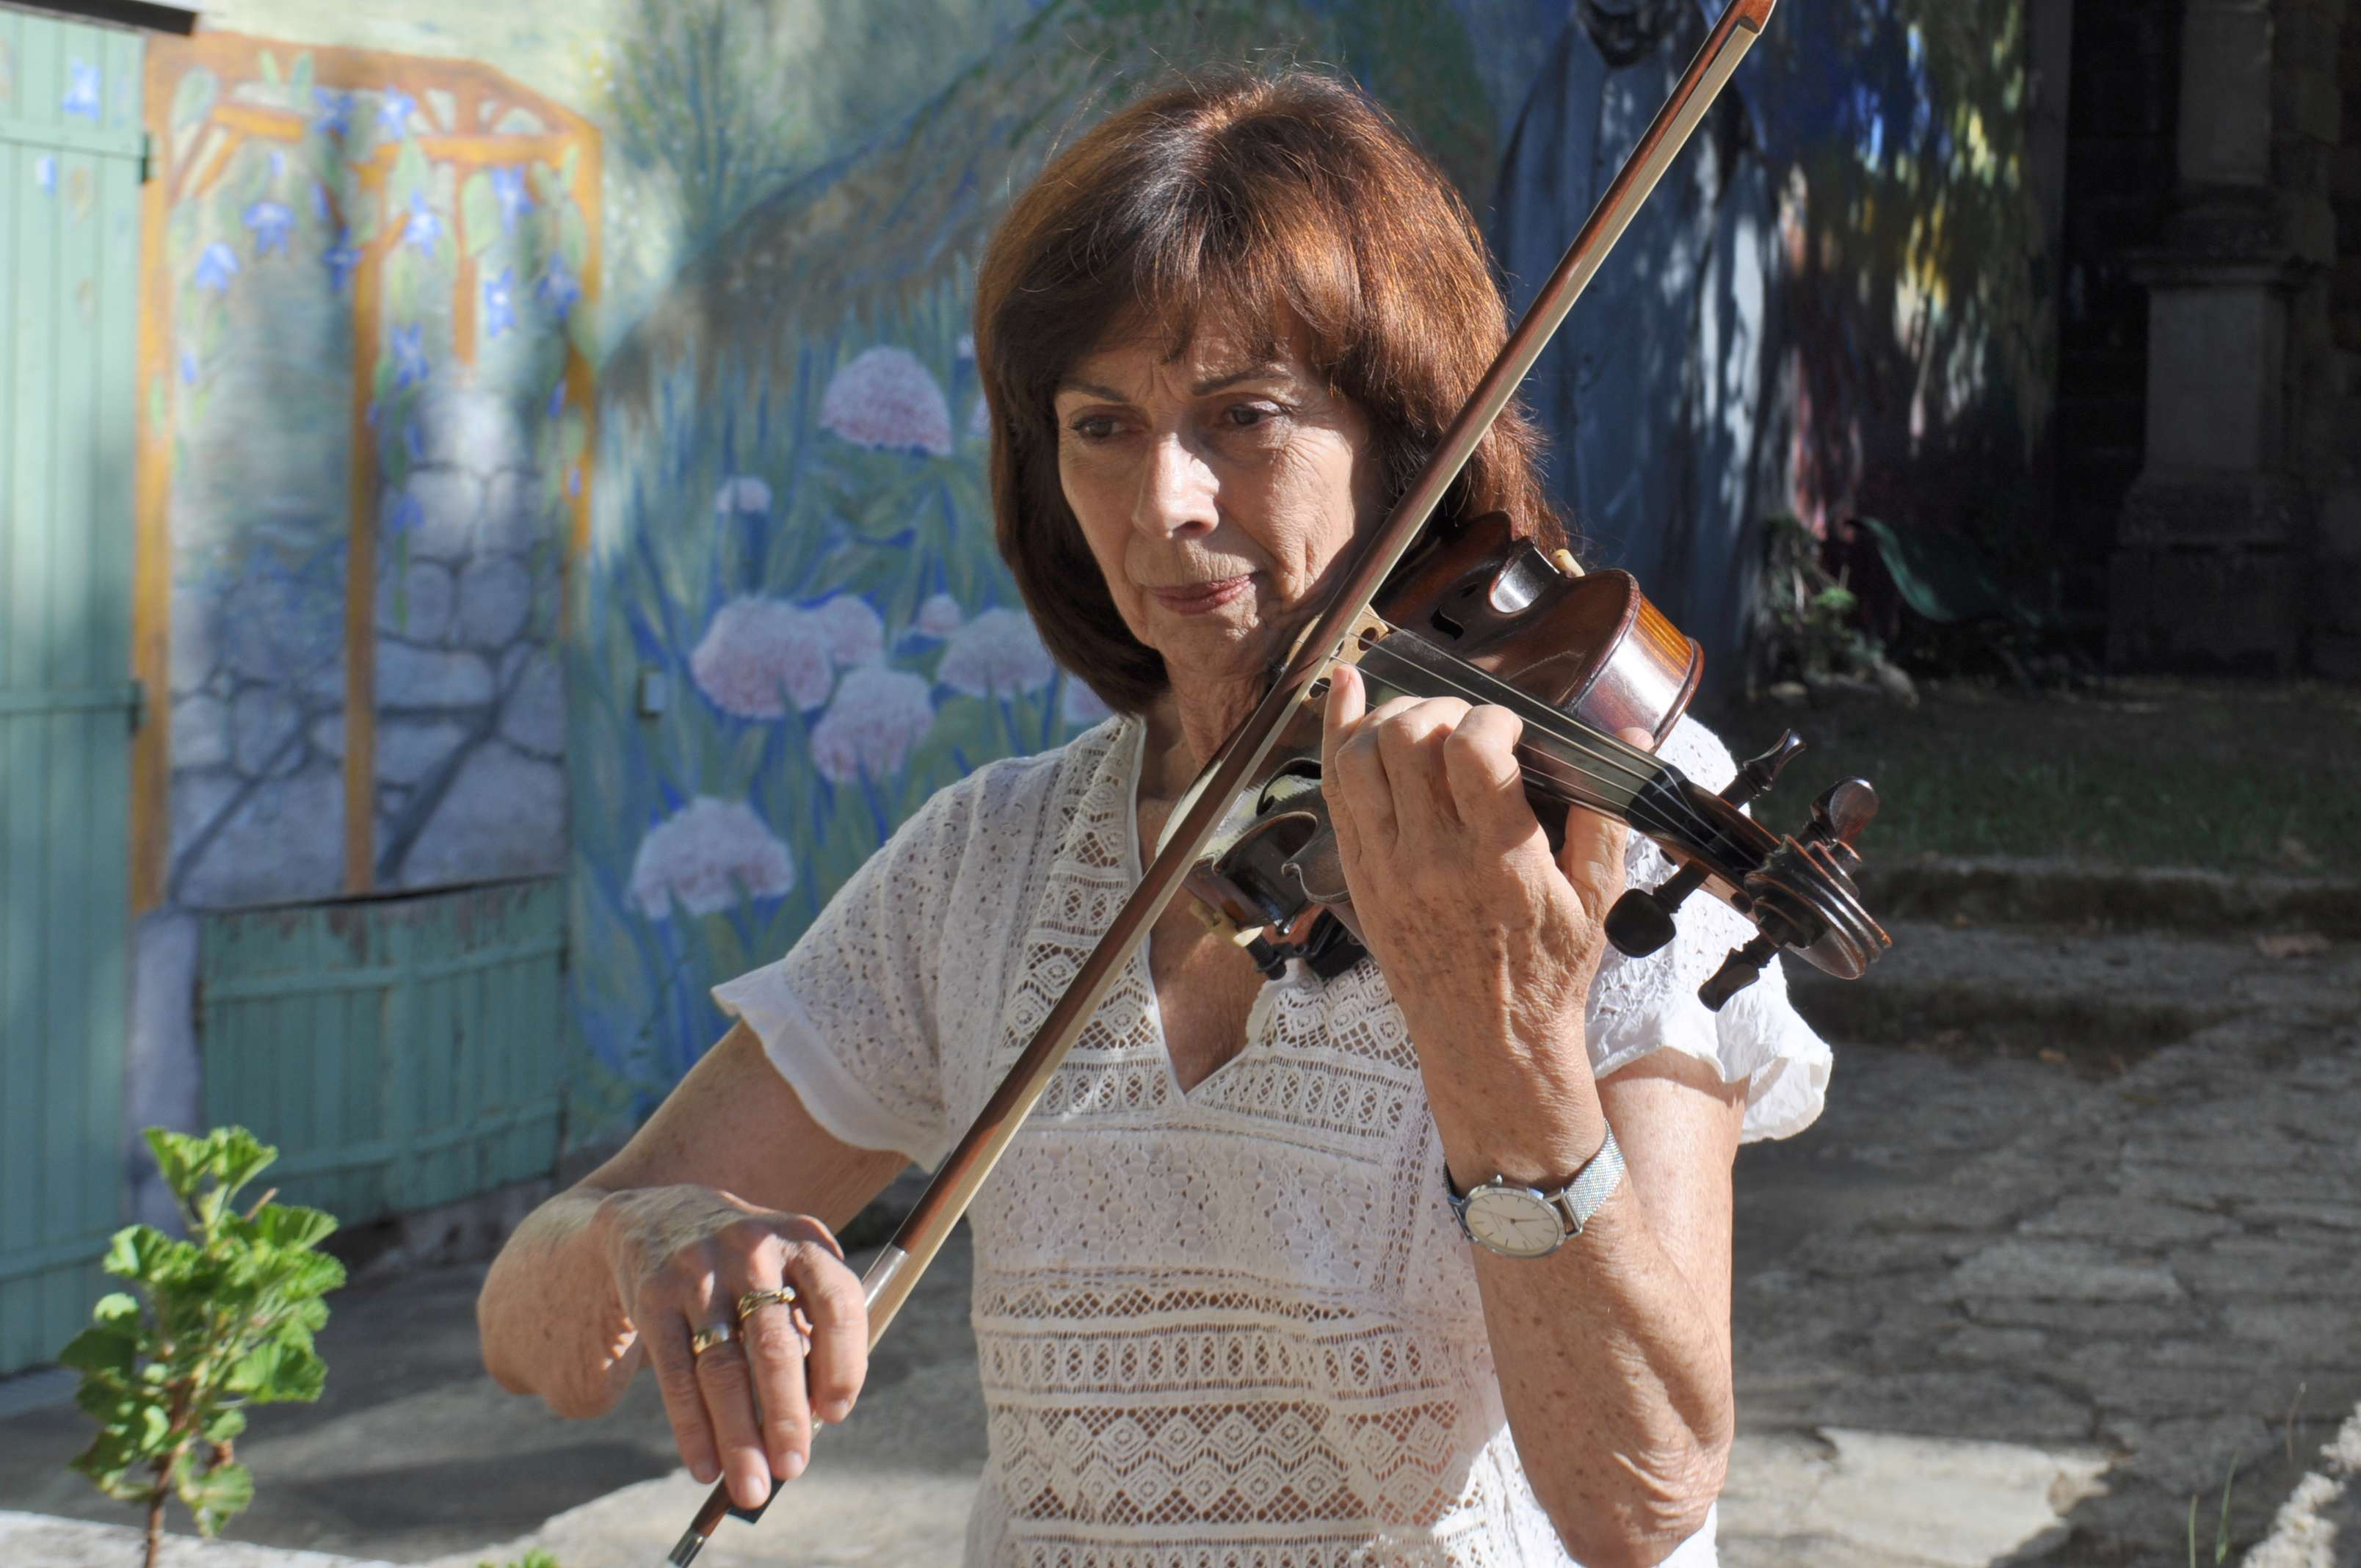 Sorru in Musica : Christiane Picciocchi, violon elle aussi...